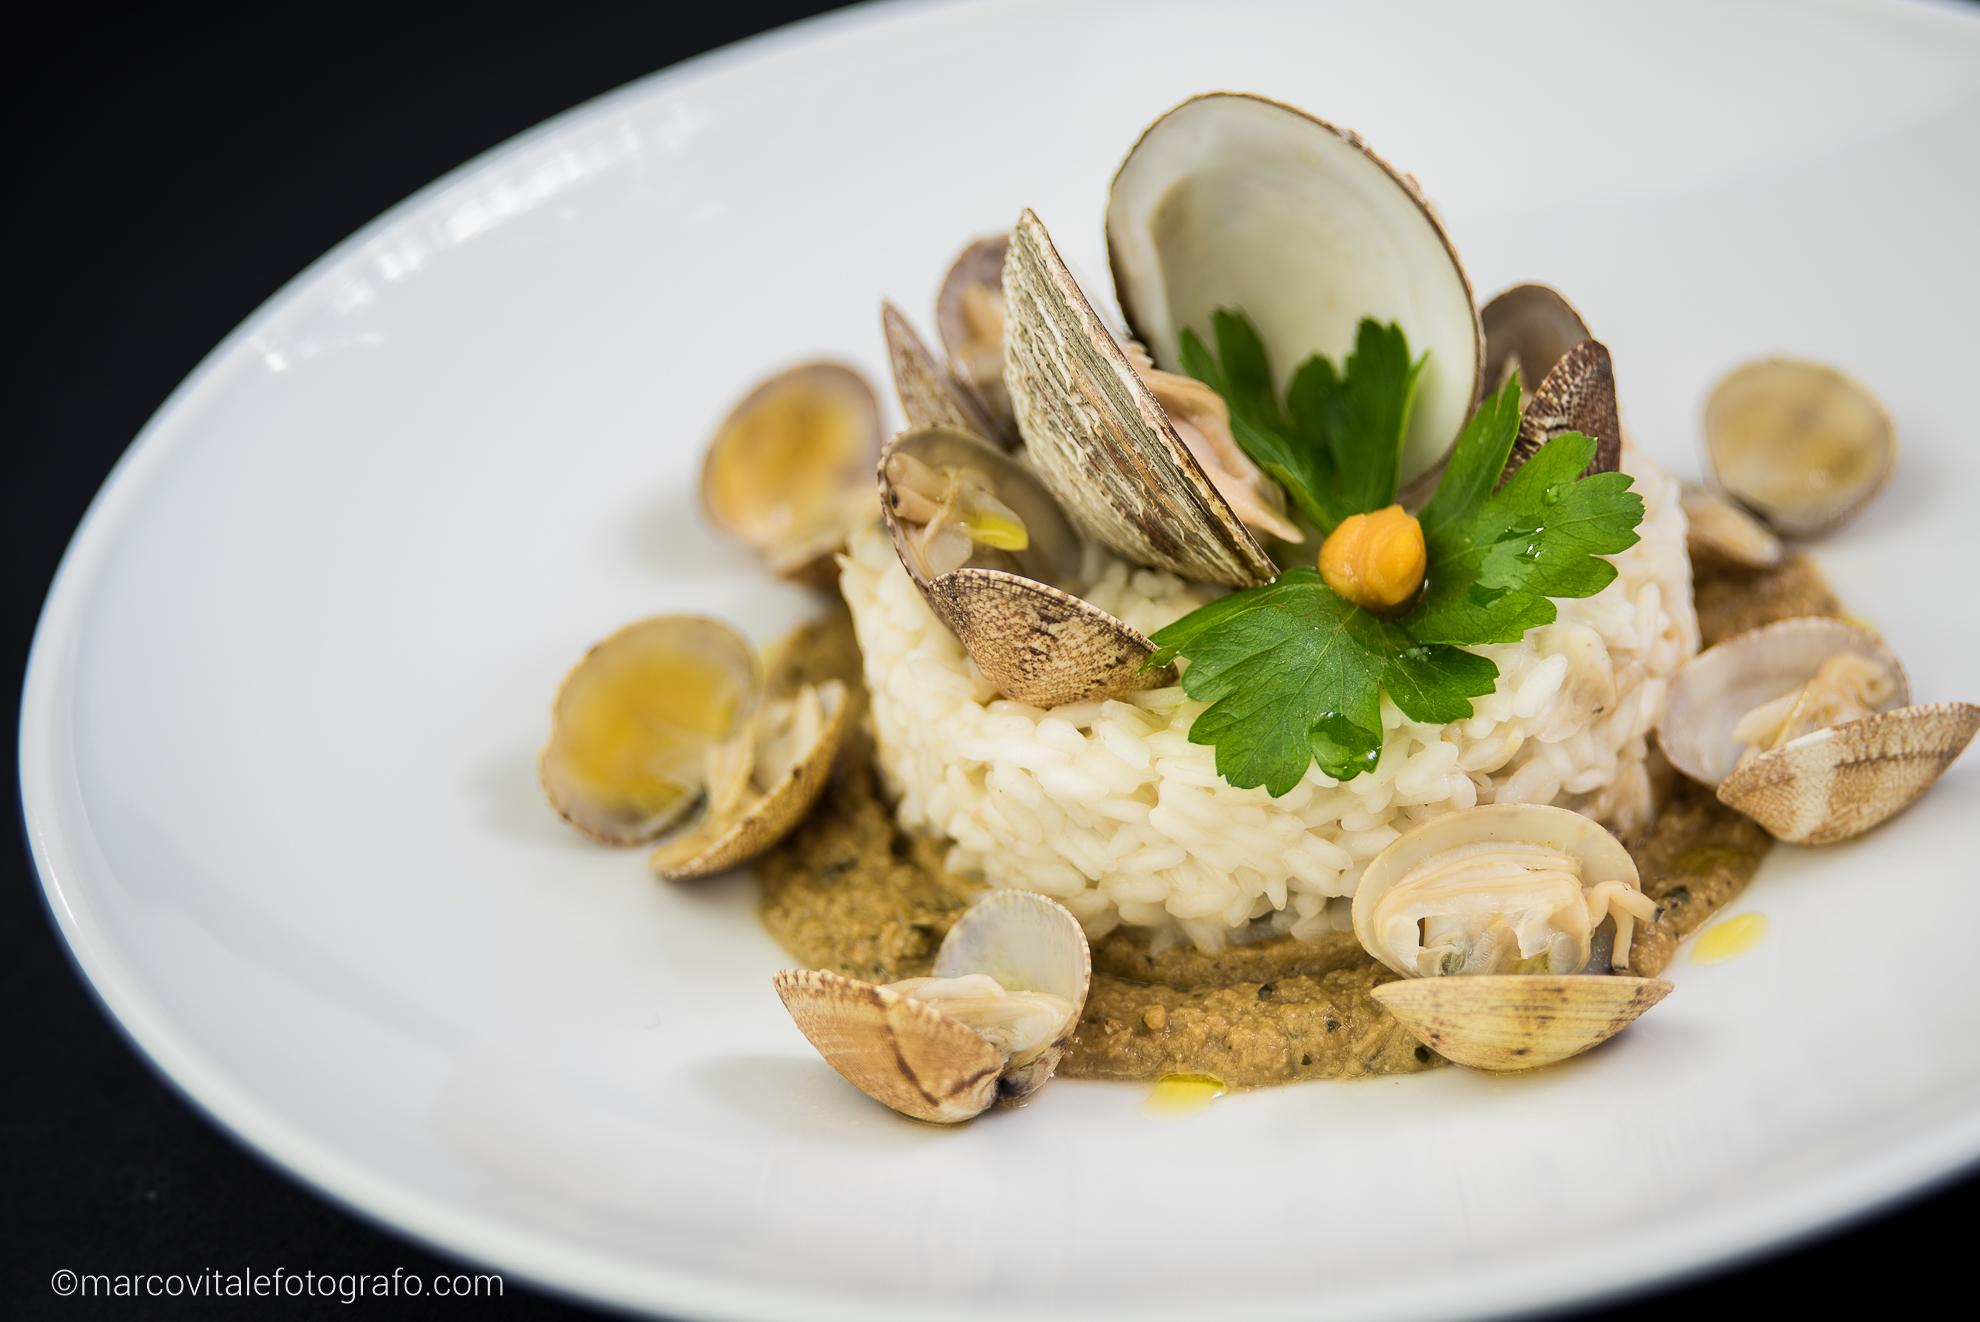 Food photographer - Salerno